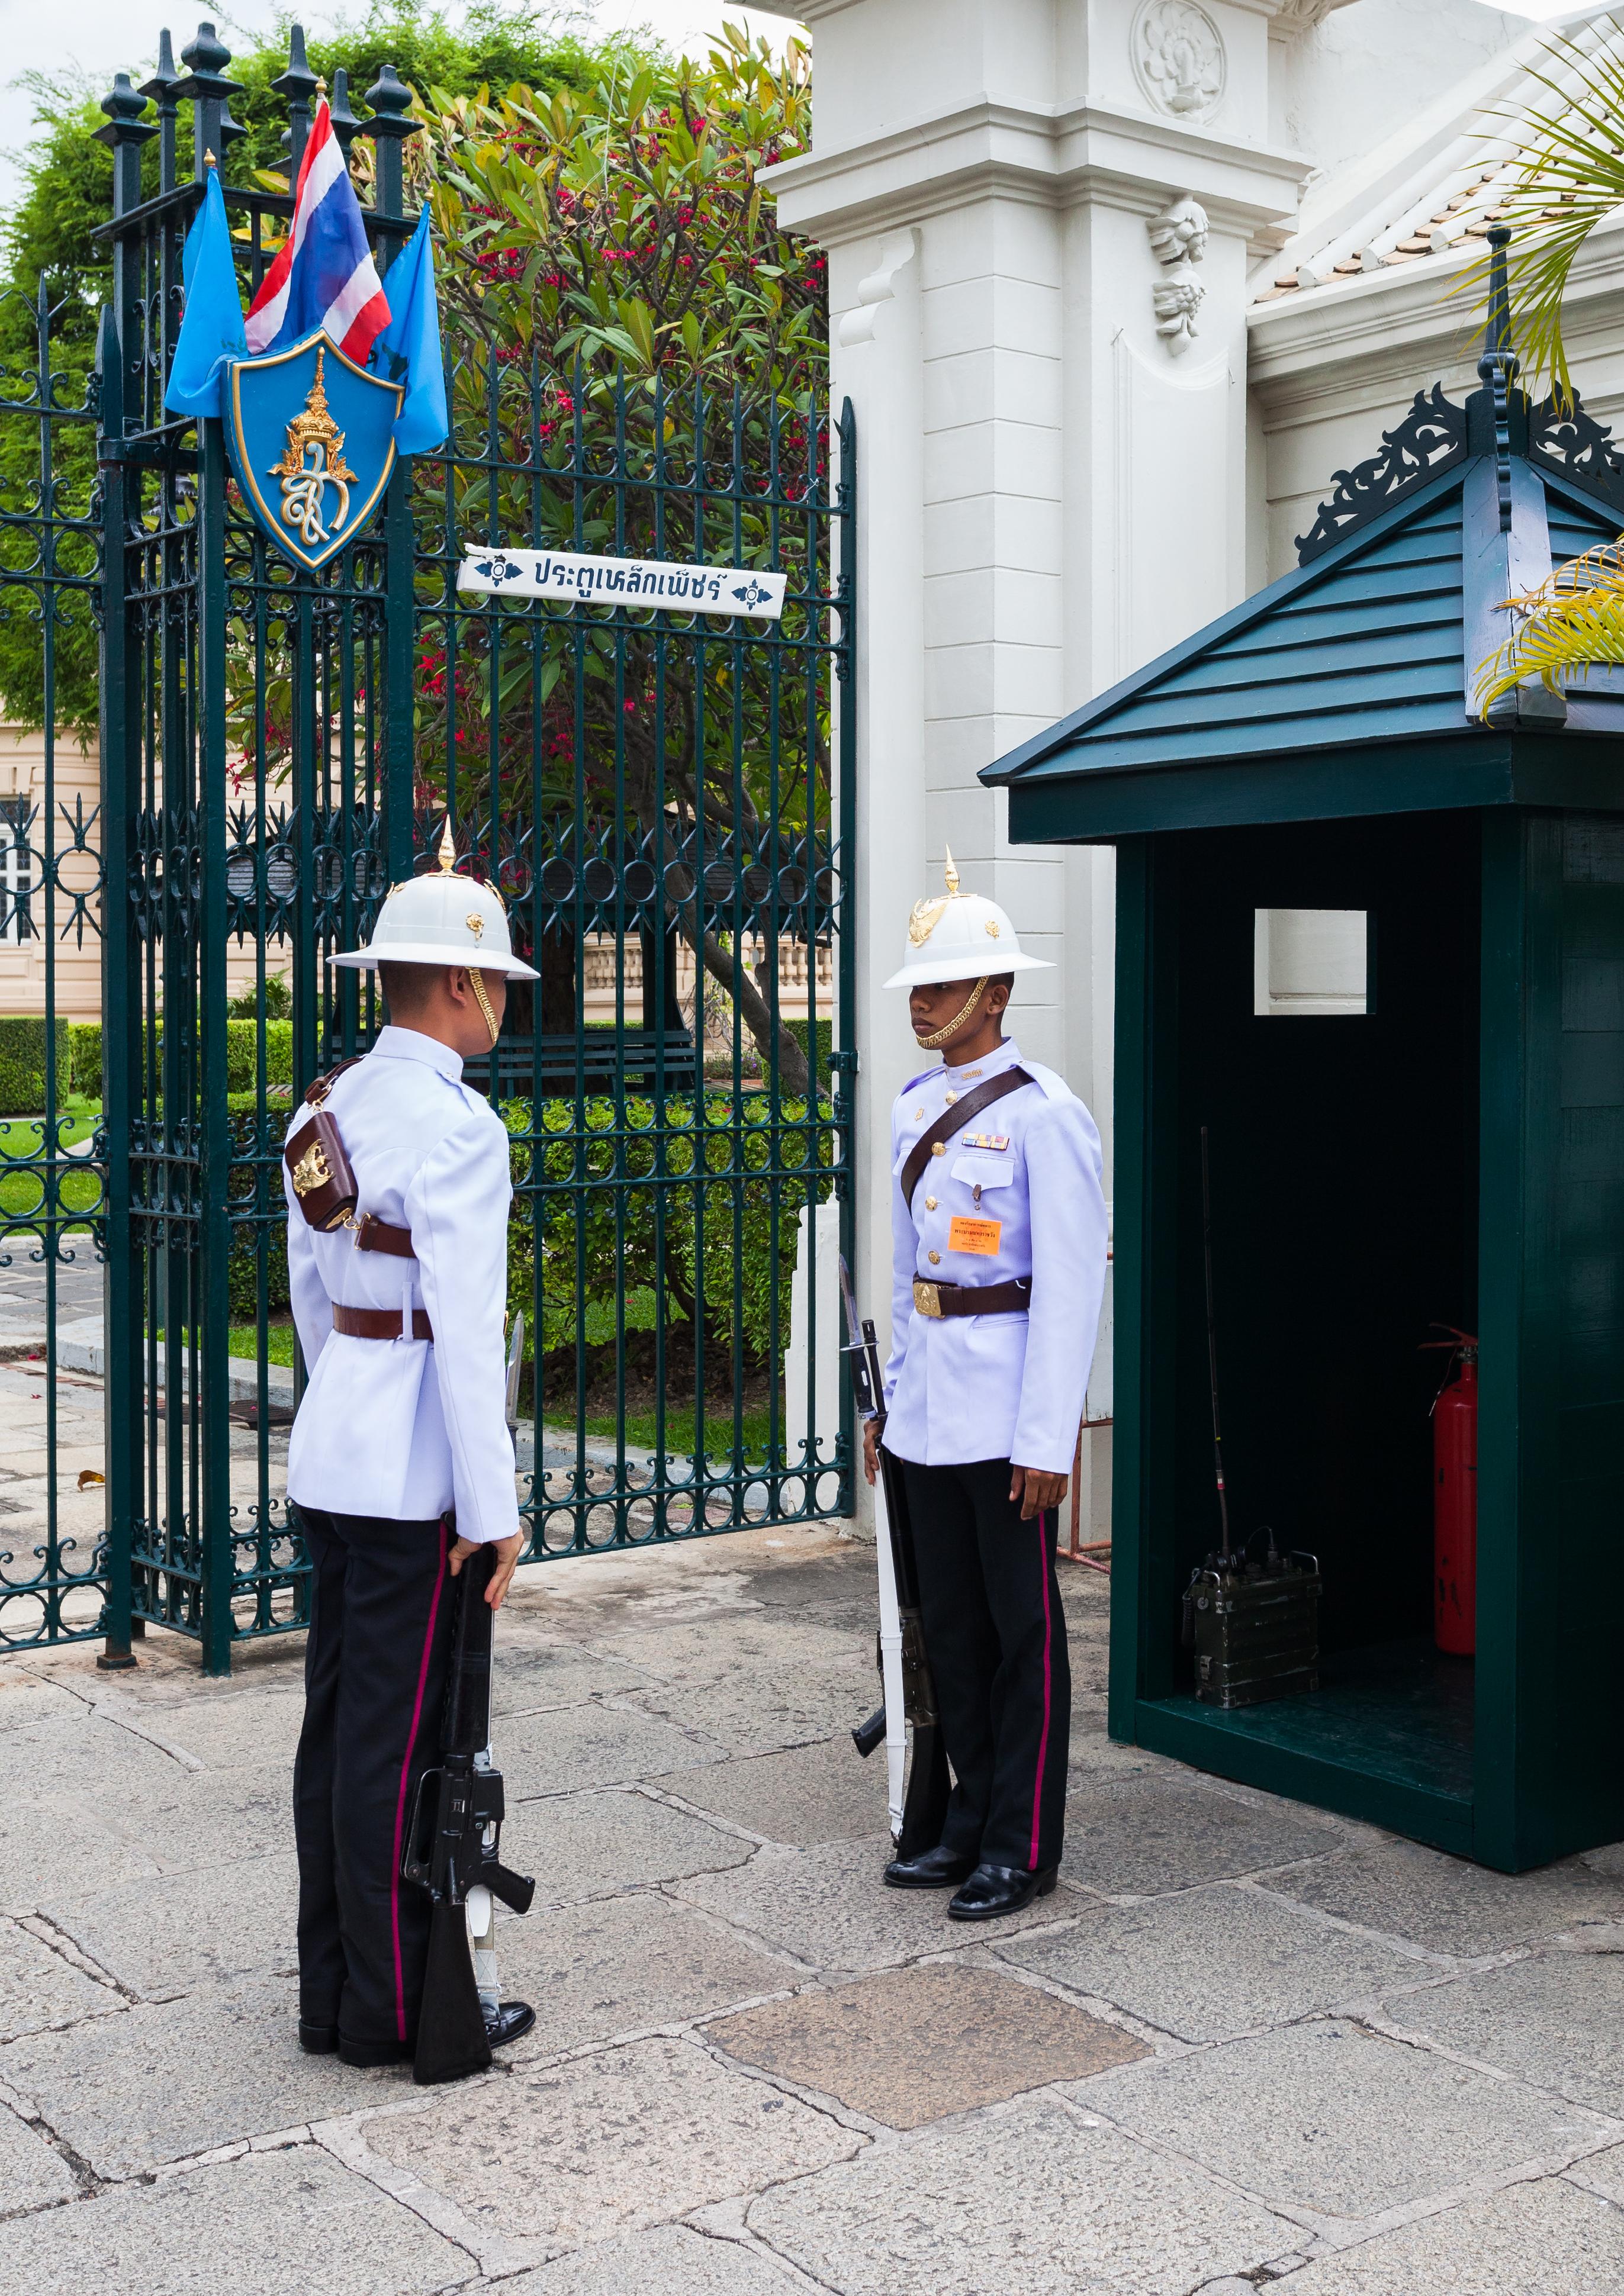 Guardia Real Tailandesa - Wikipedia, la enciclopedia libre